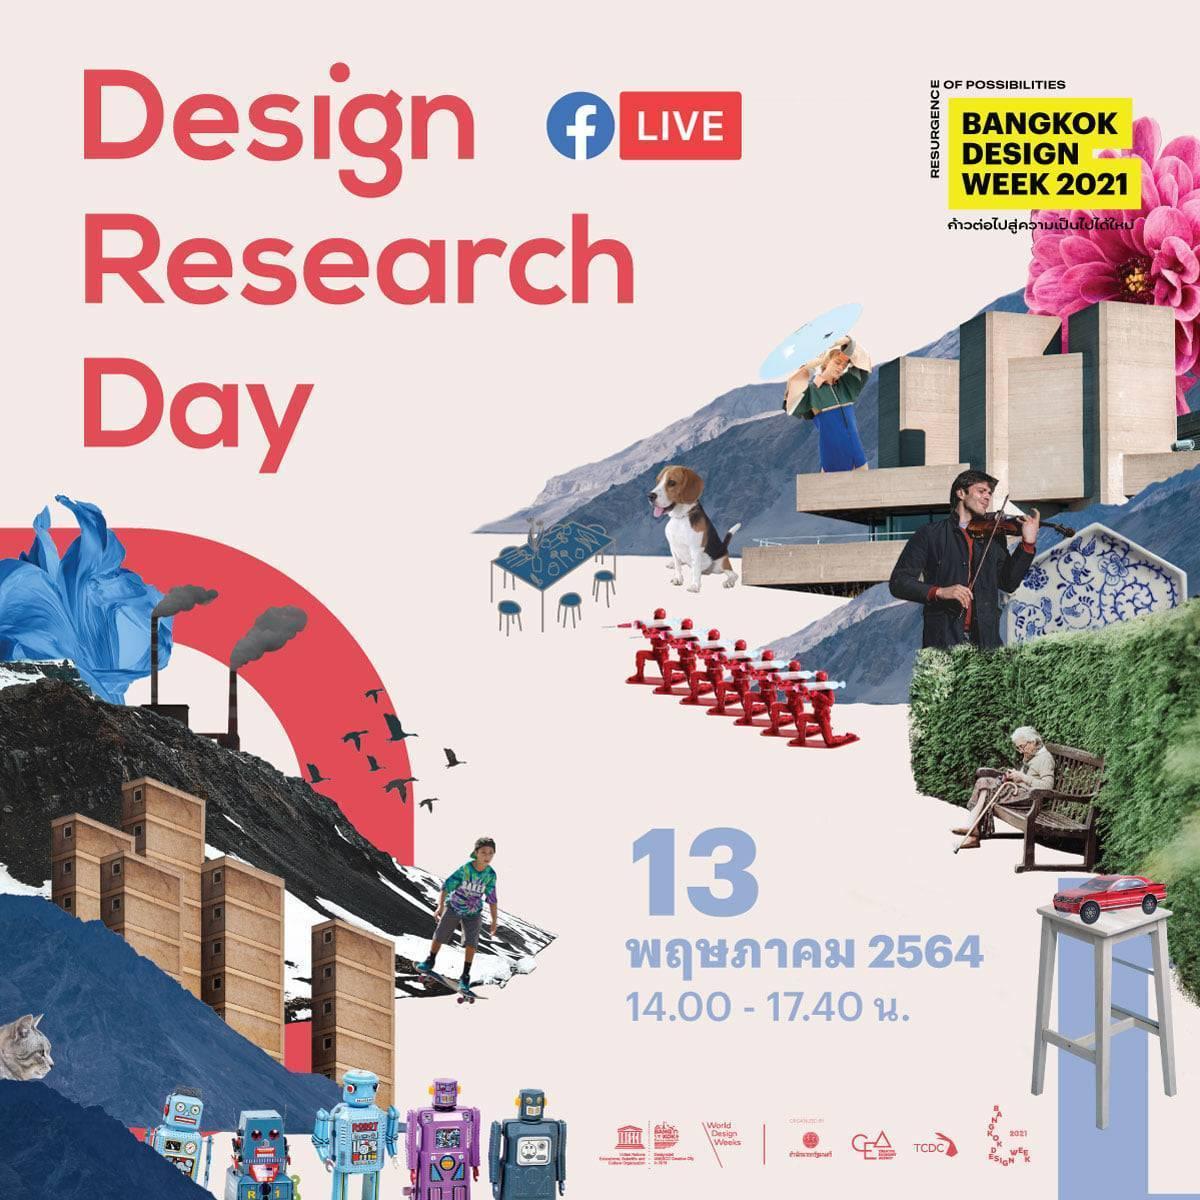 'Bangkok Design Week 2021' 9 กิจกรรมทอล์คออนไลน์ ที่จะทำให้คุณเปิดโลกแห่งความคิดสร้างสรรค์